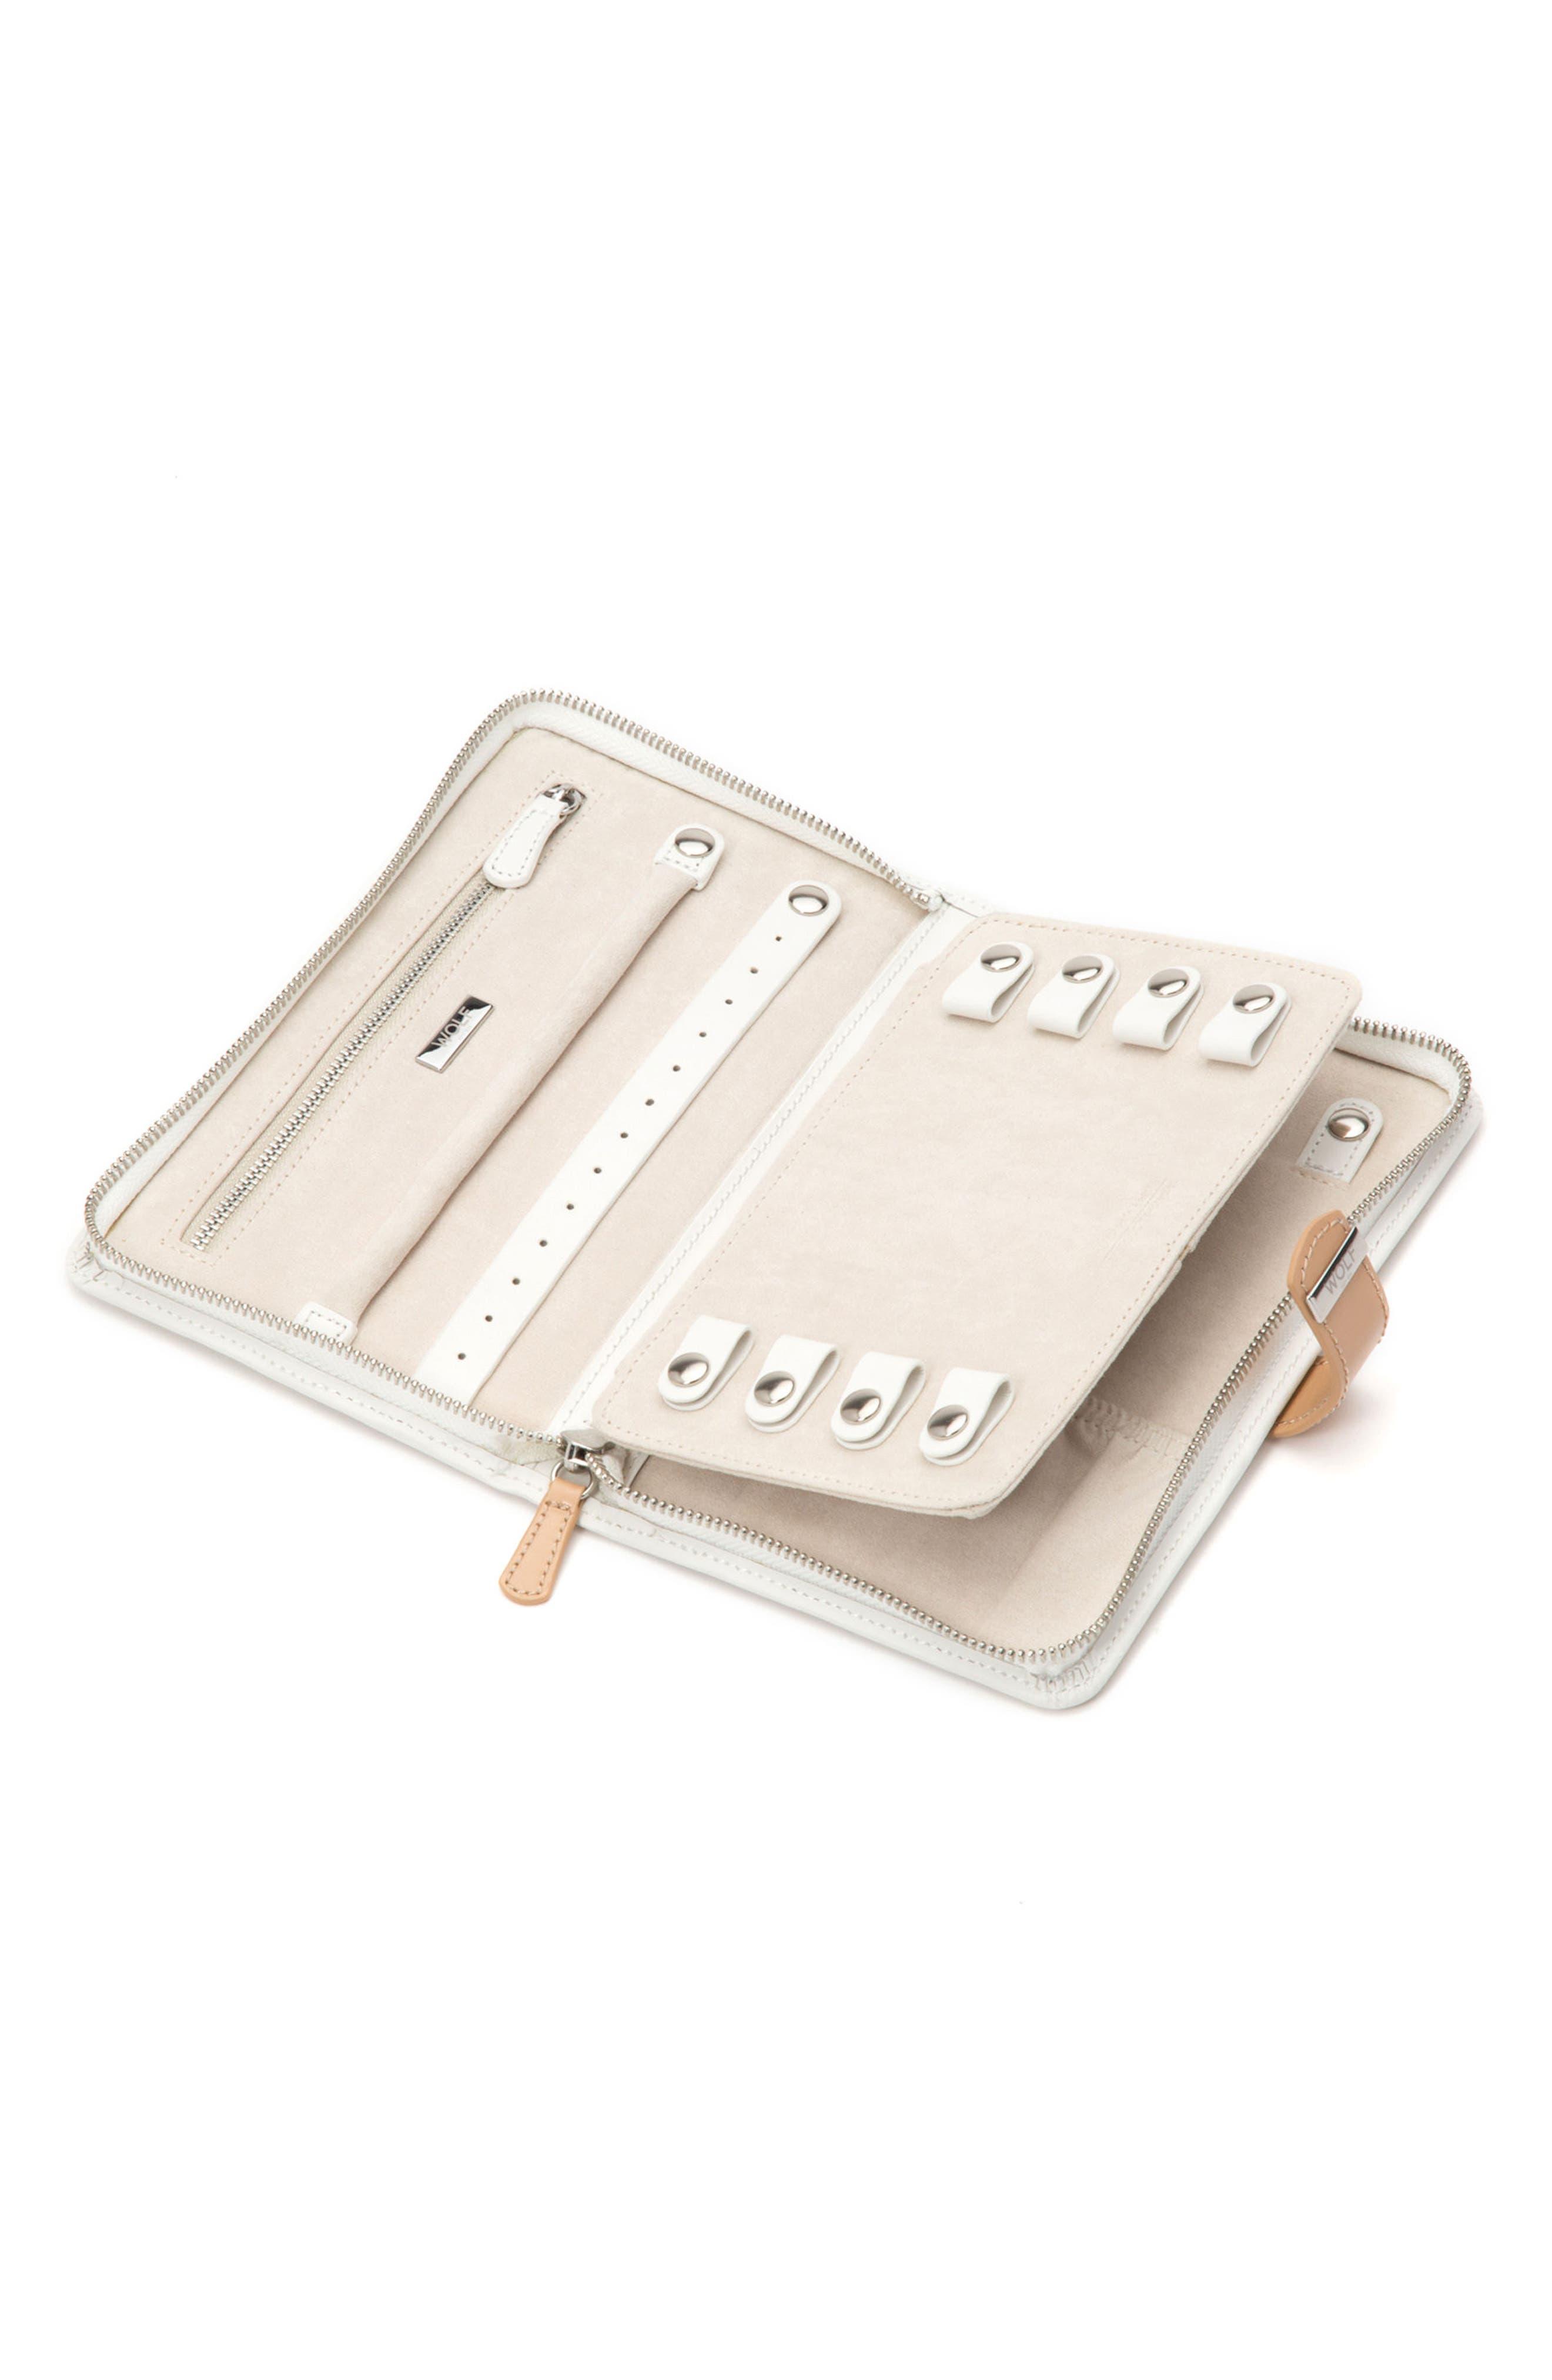 Blossom Leather Jewelry Portfolio,                             Alternate thumbnail 4, color,                             IVORY